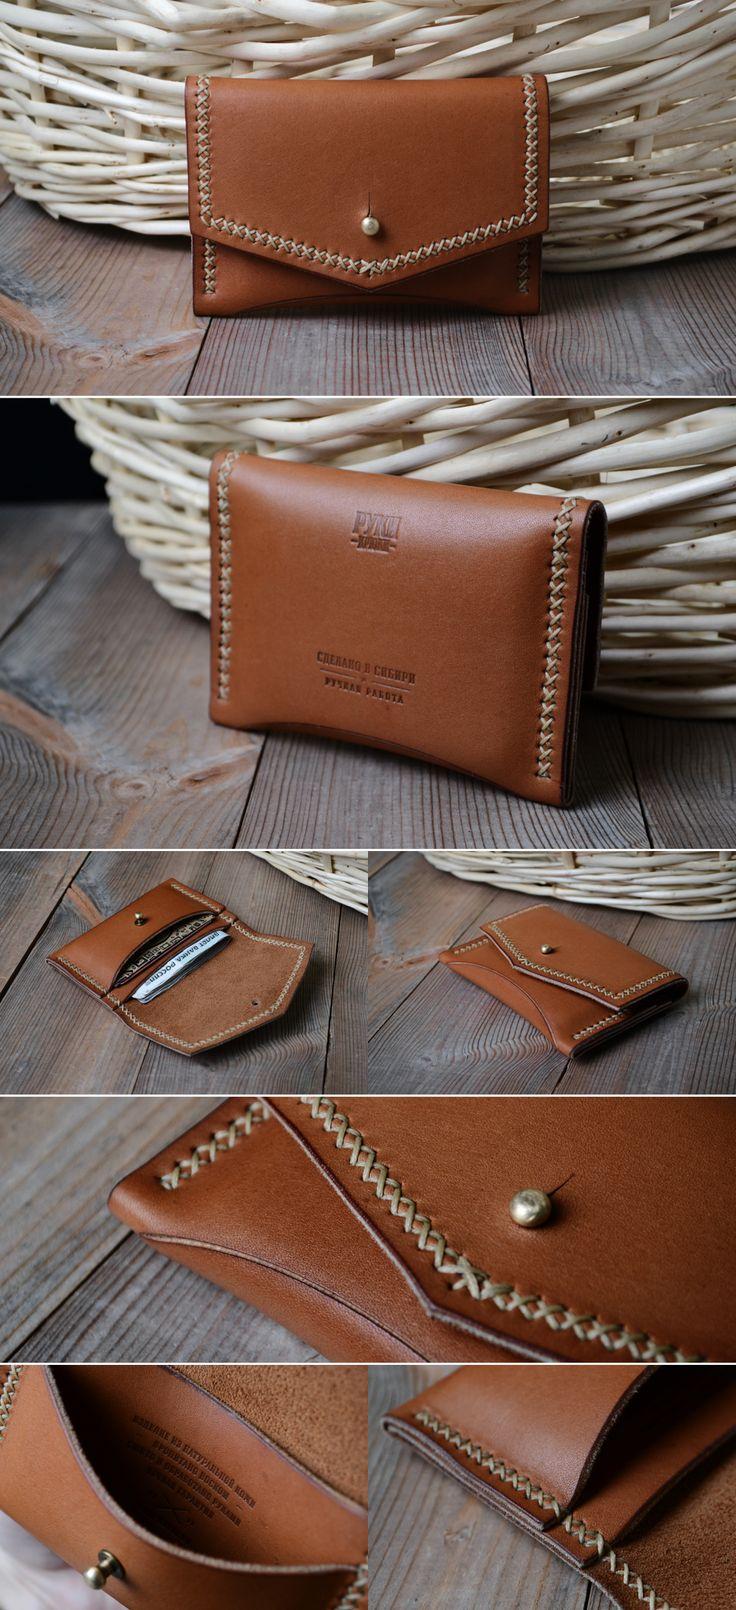 Little update for Card-holder RUKI-KRYKI / Made in Siberia